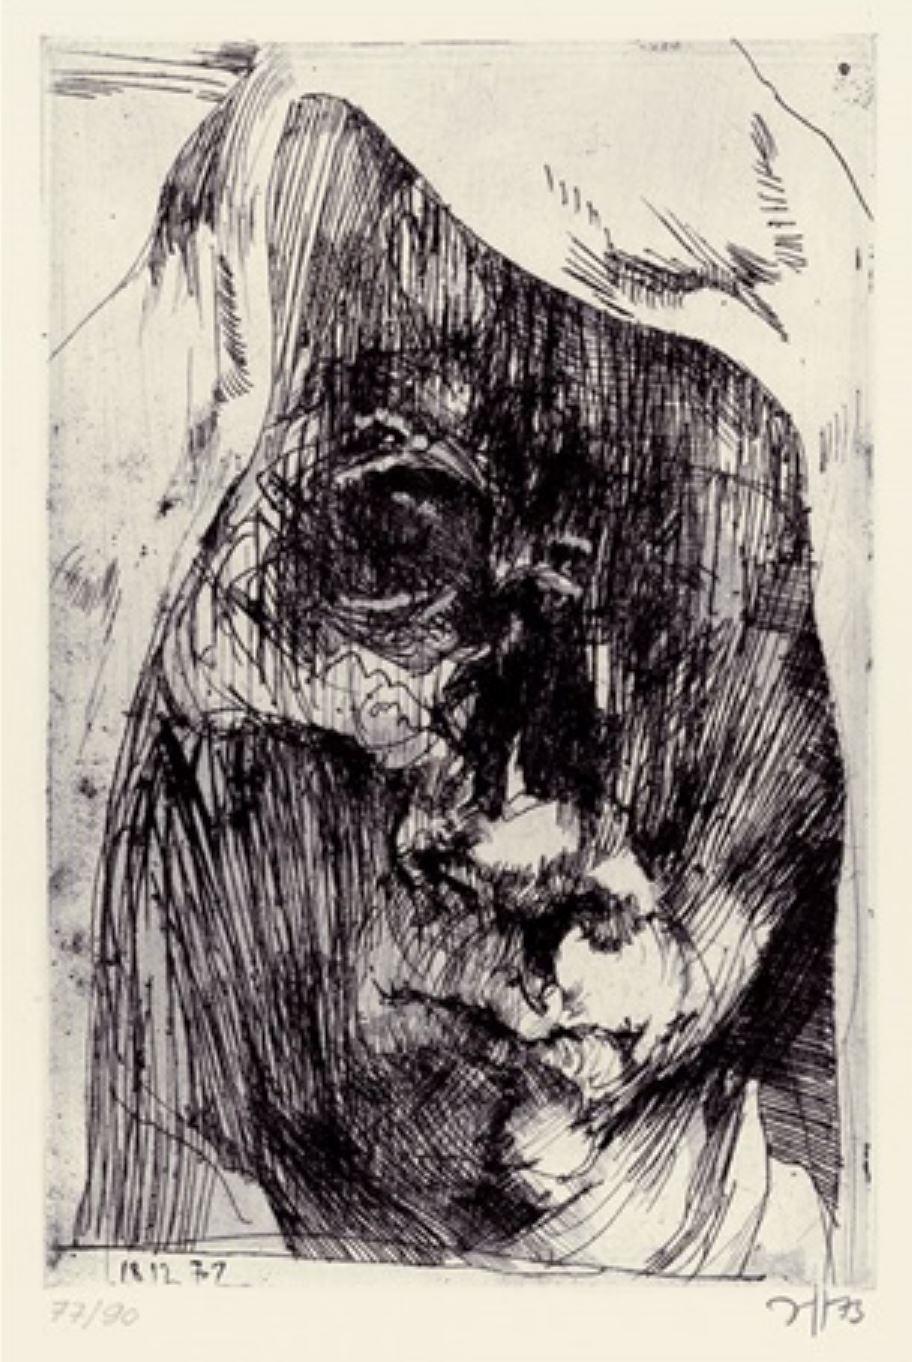 Horst janssen 18.12.72 serie Hanno's Tod